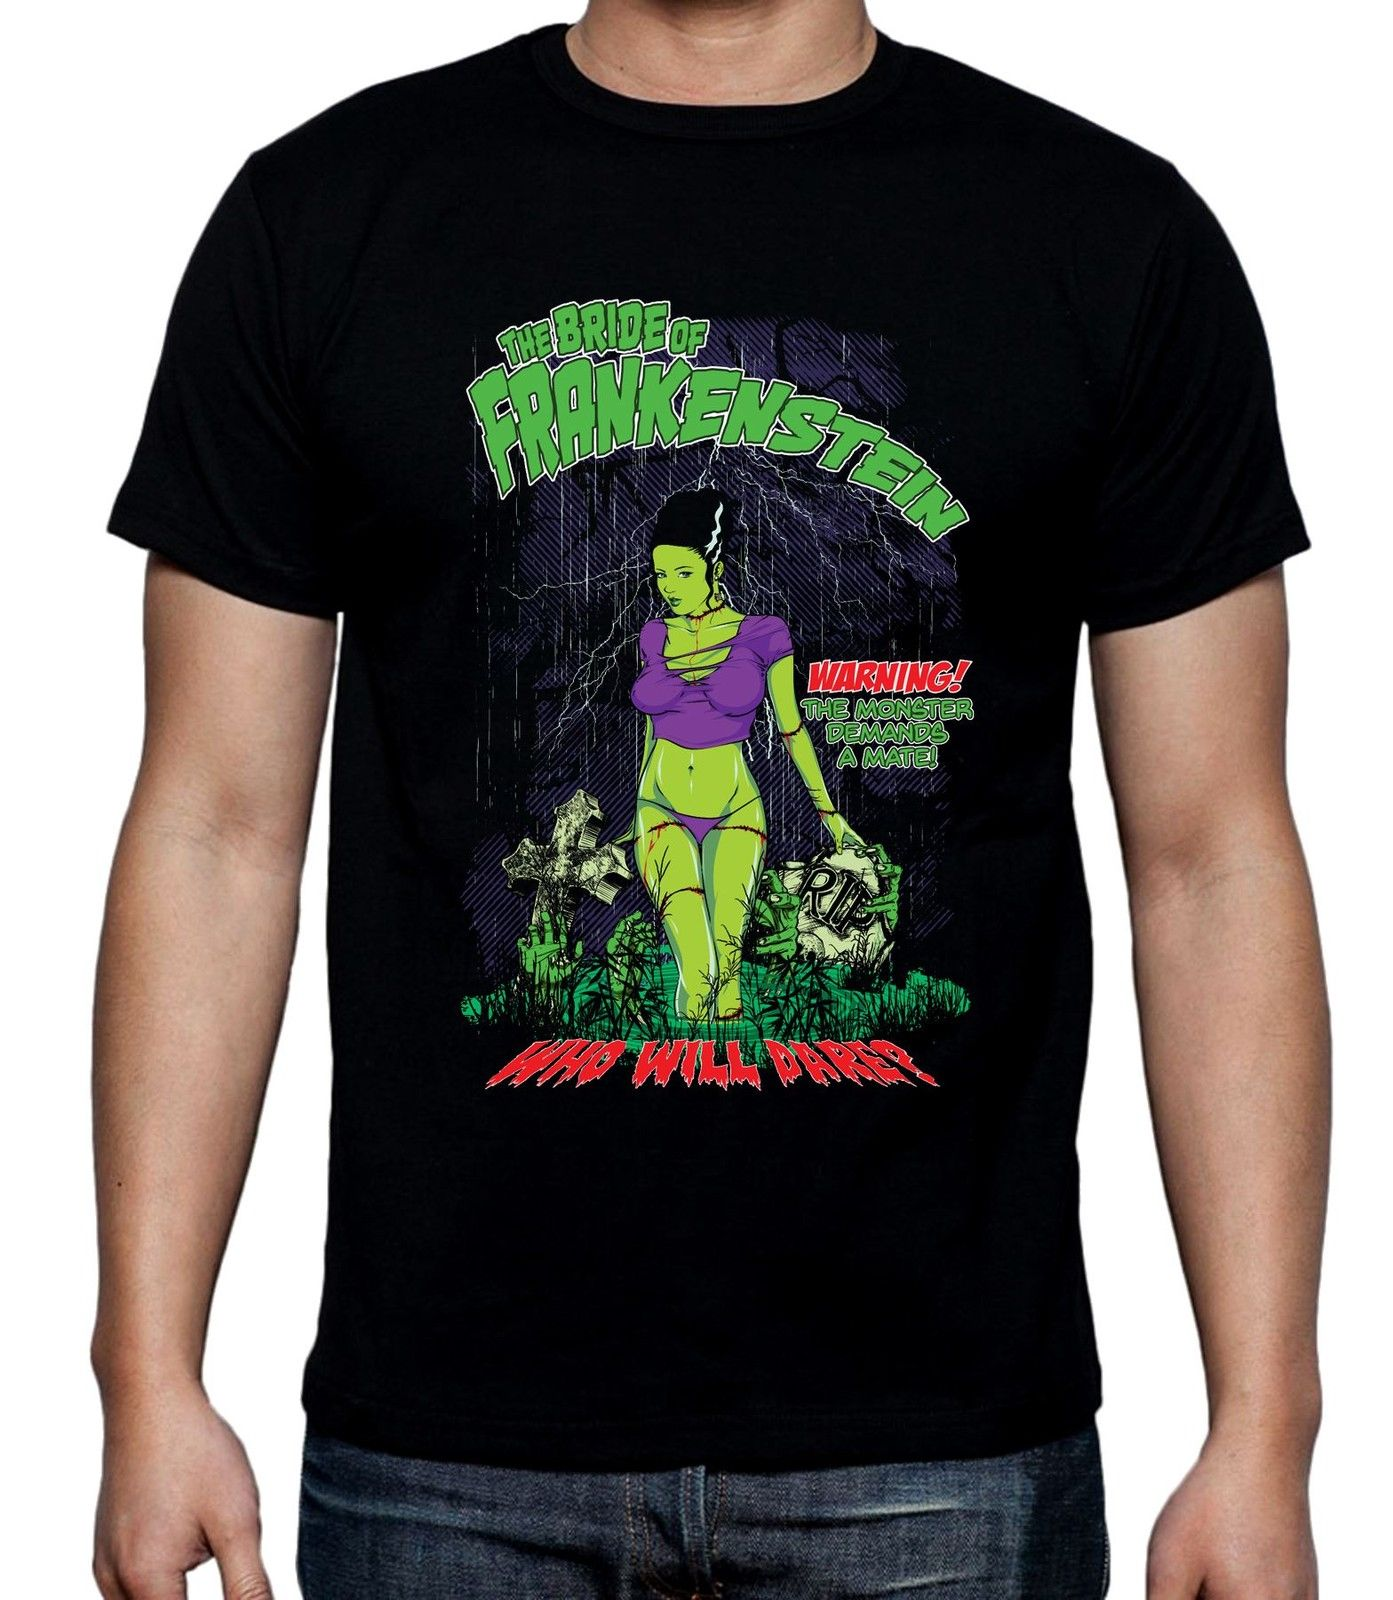 Bride of Frankenstein Who Will Dare Men 39 s T Shirt Halloween Horror Film Cartoon t shirt men Unisex New Fashion tshirt in T Shirts from Men 39 s Clothing